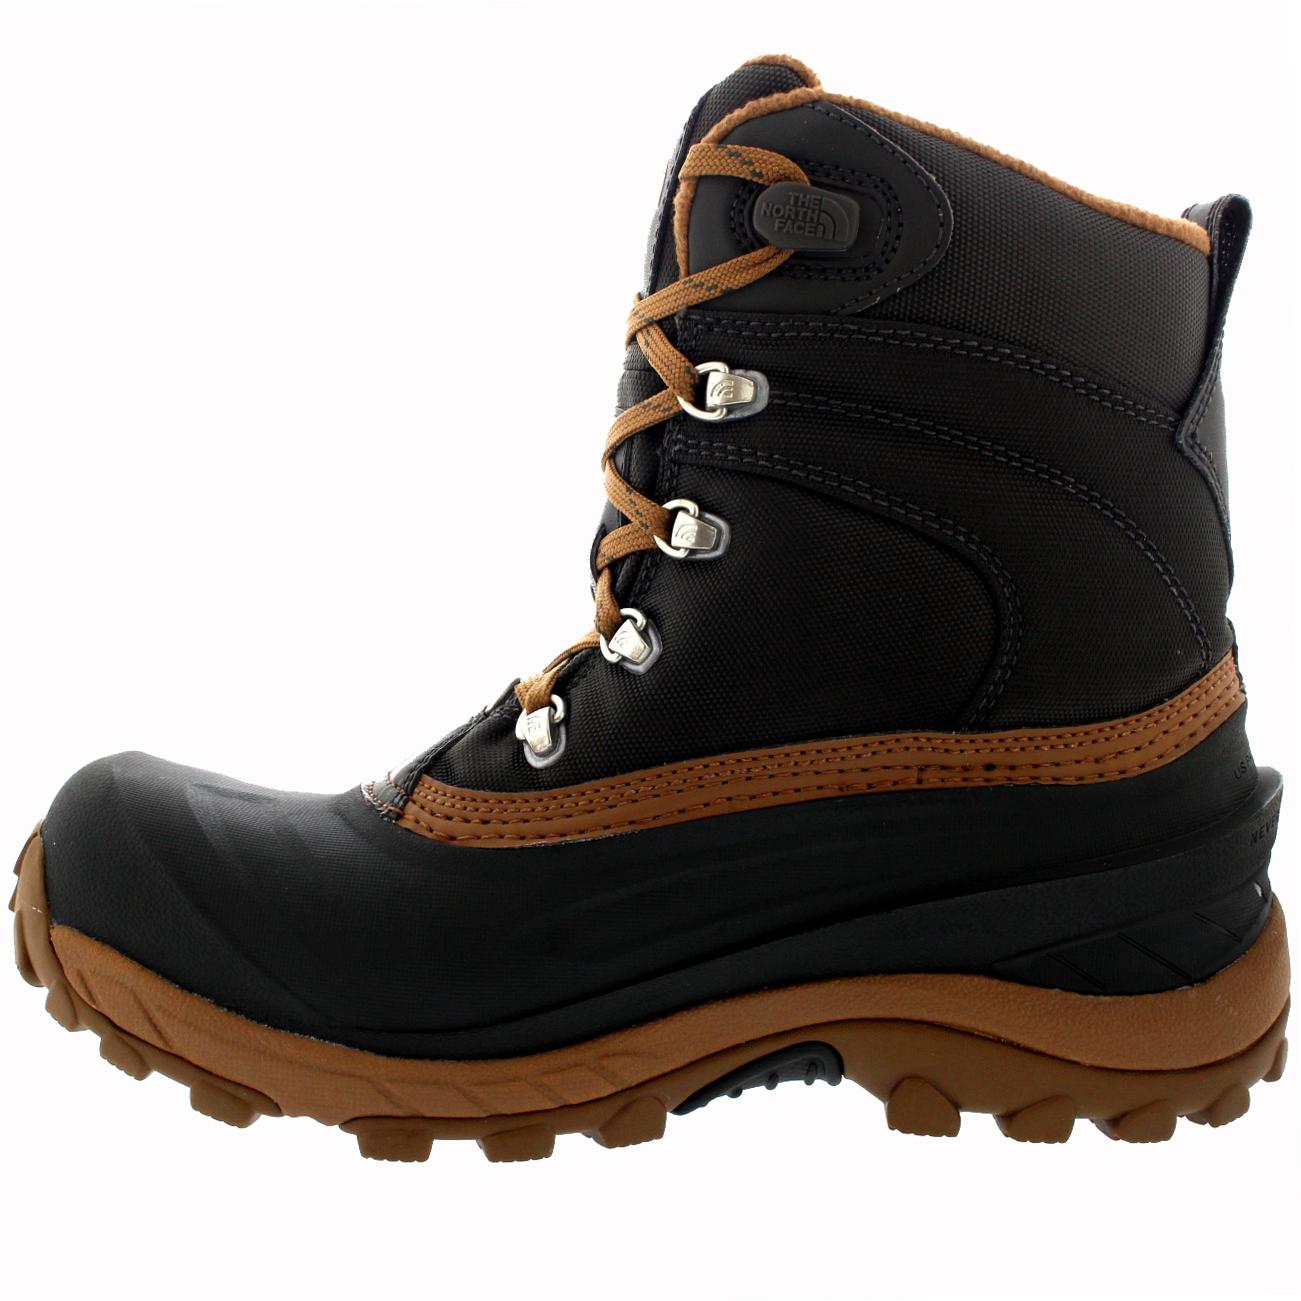 North Face Waterproof Walking Shoes